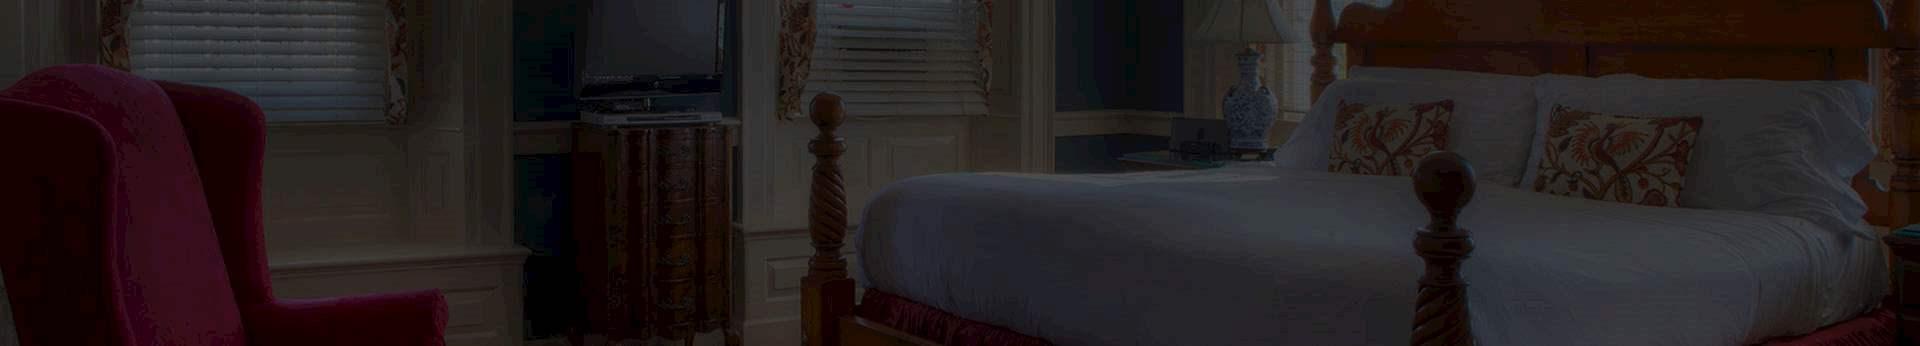 The Francis Malbone House, Newport Rooms